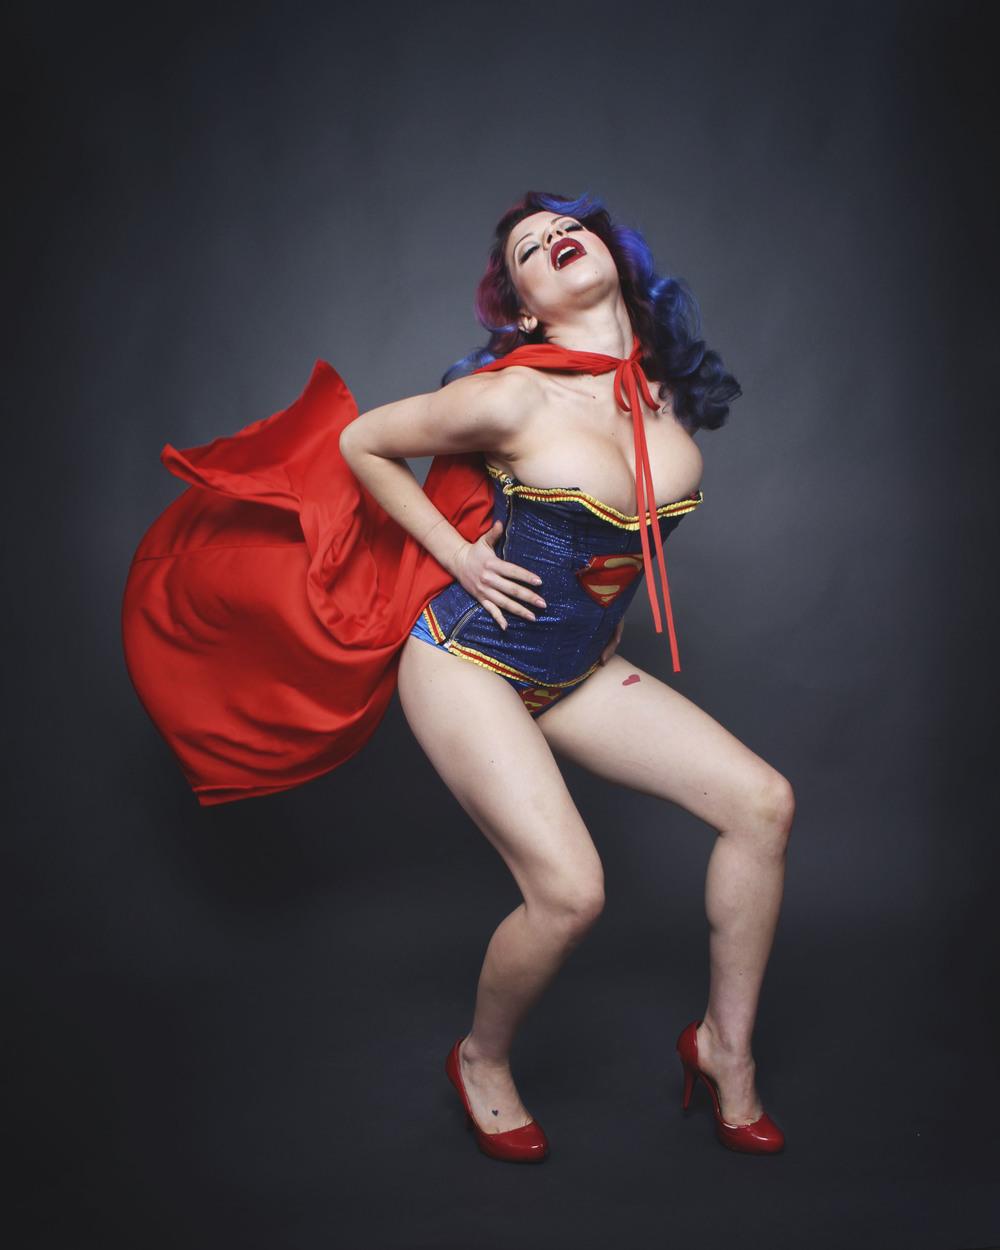 Suicide Girl Burlesque Show Shoot - Stephanie Rachel Guttenplan